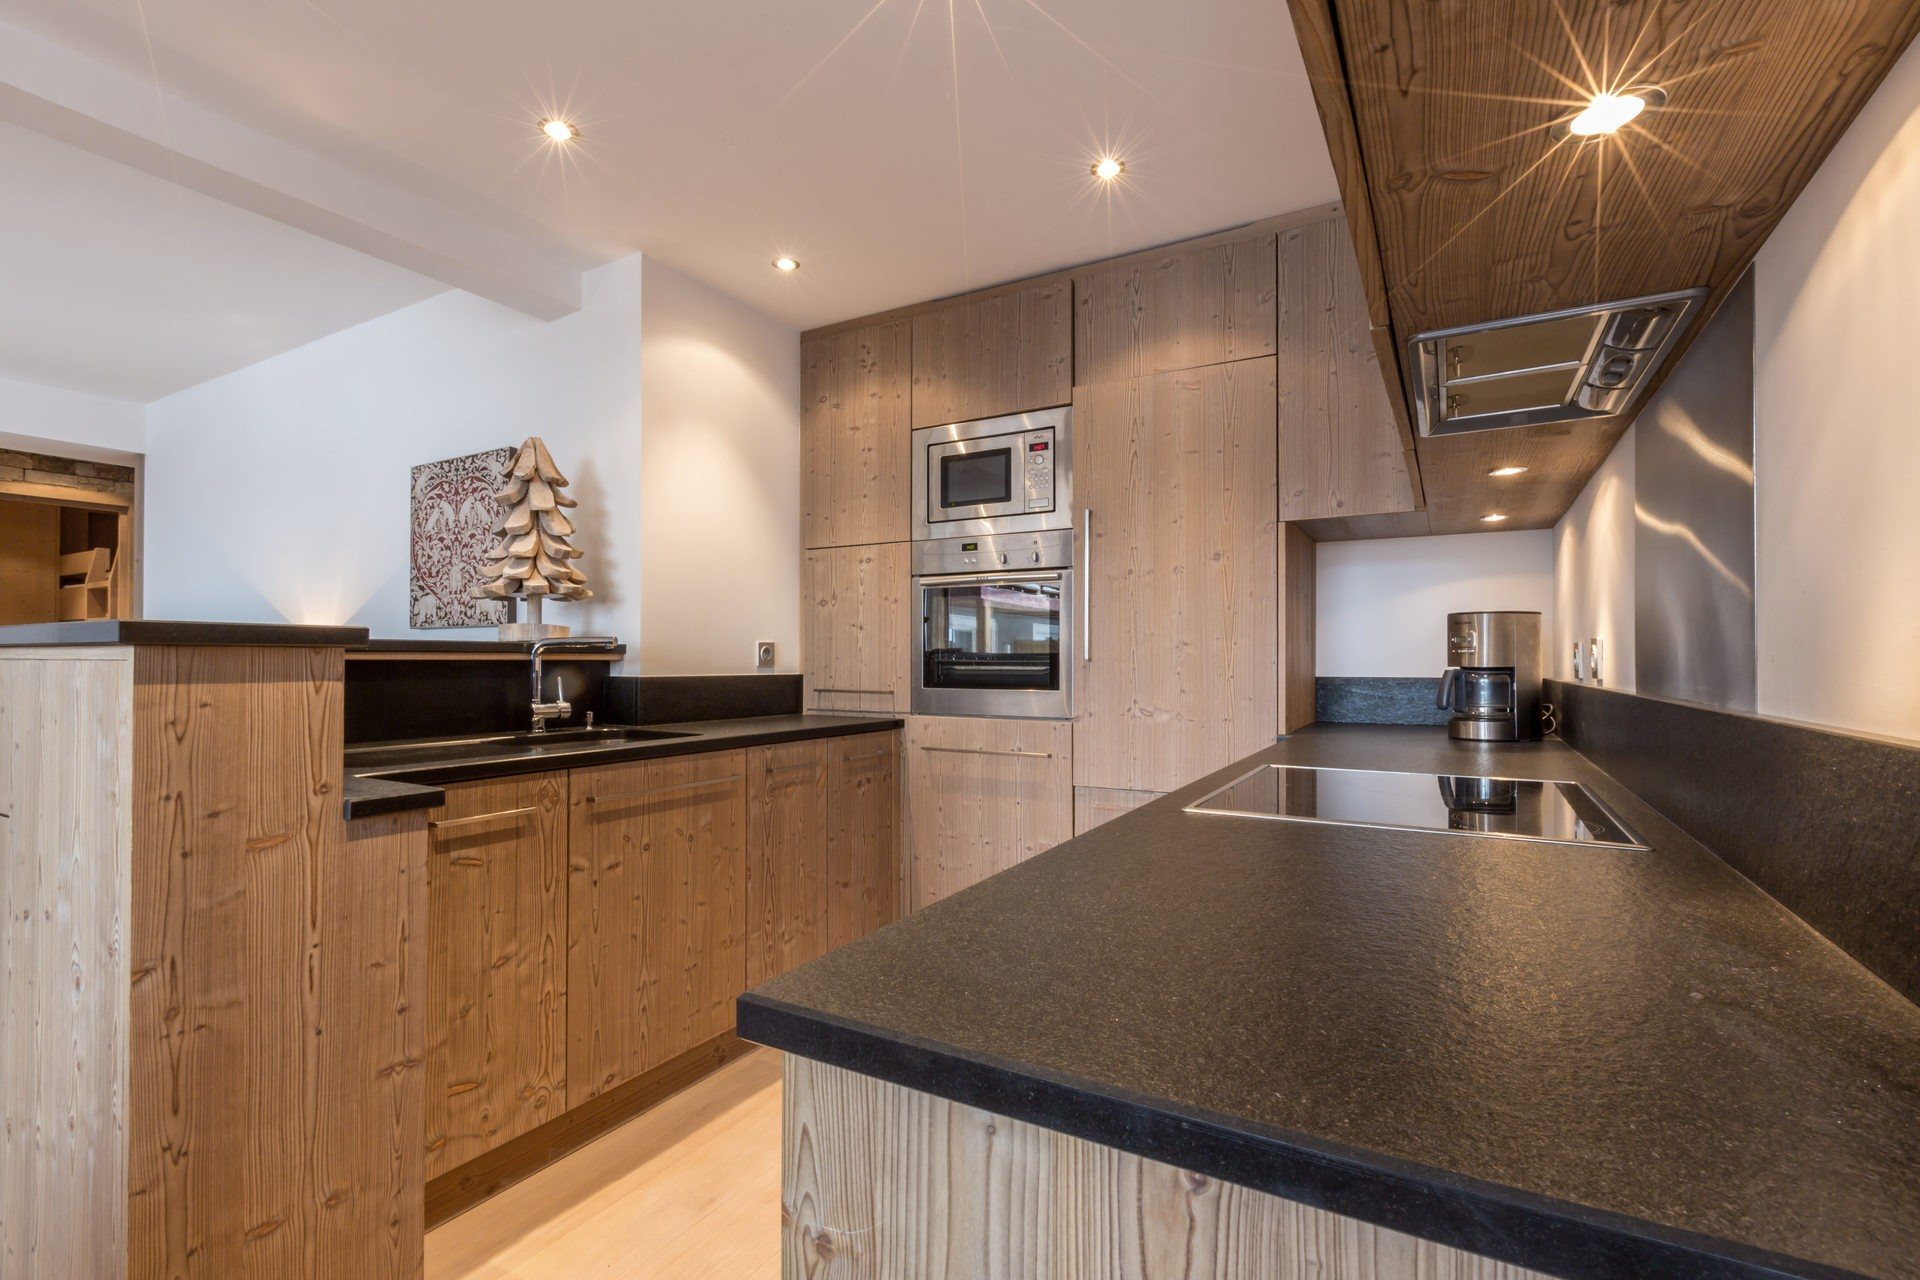 Val d'Isère Location Appartement Luxe Vaselate Cuisine